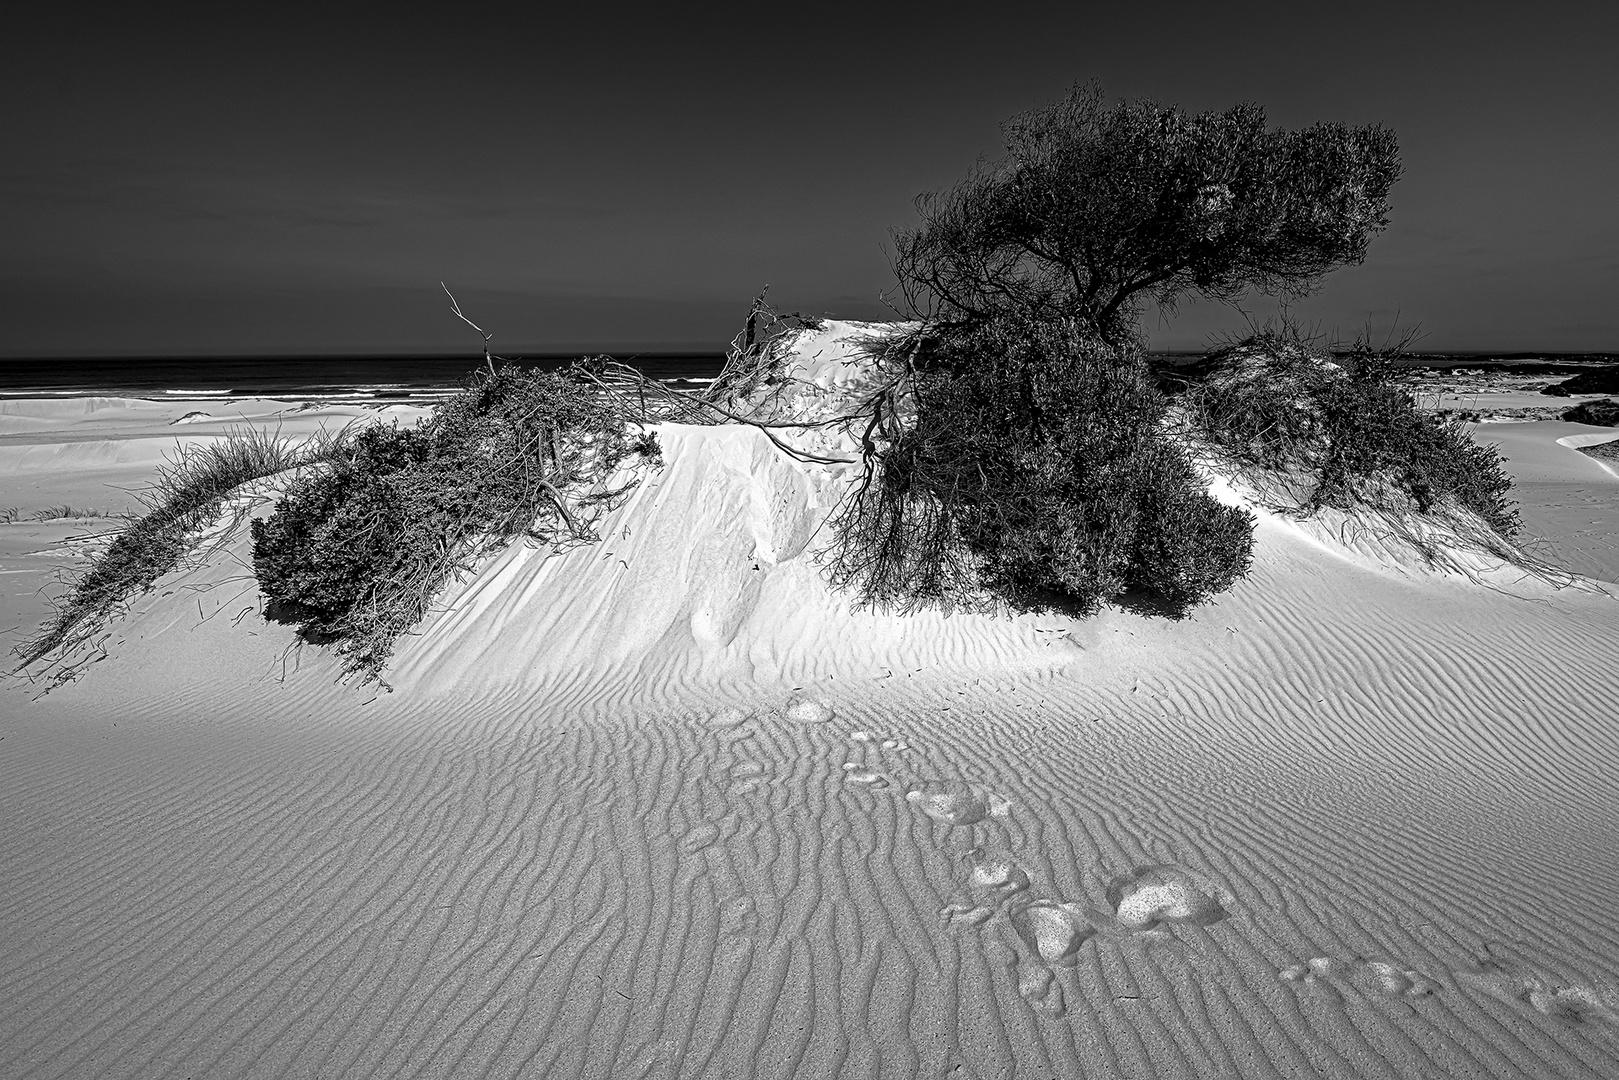 Dunes near Bettys Bay South Africa